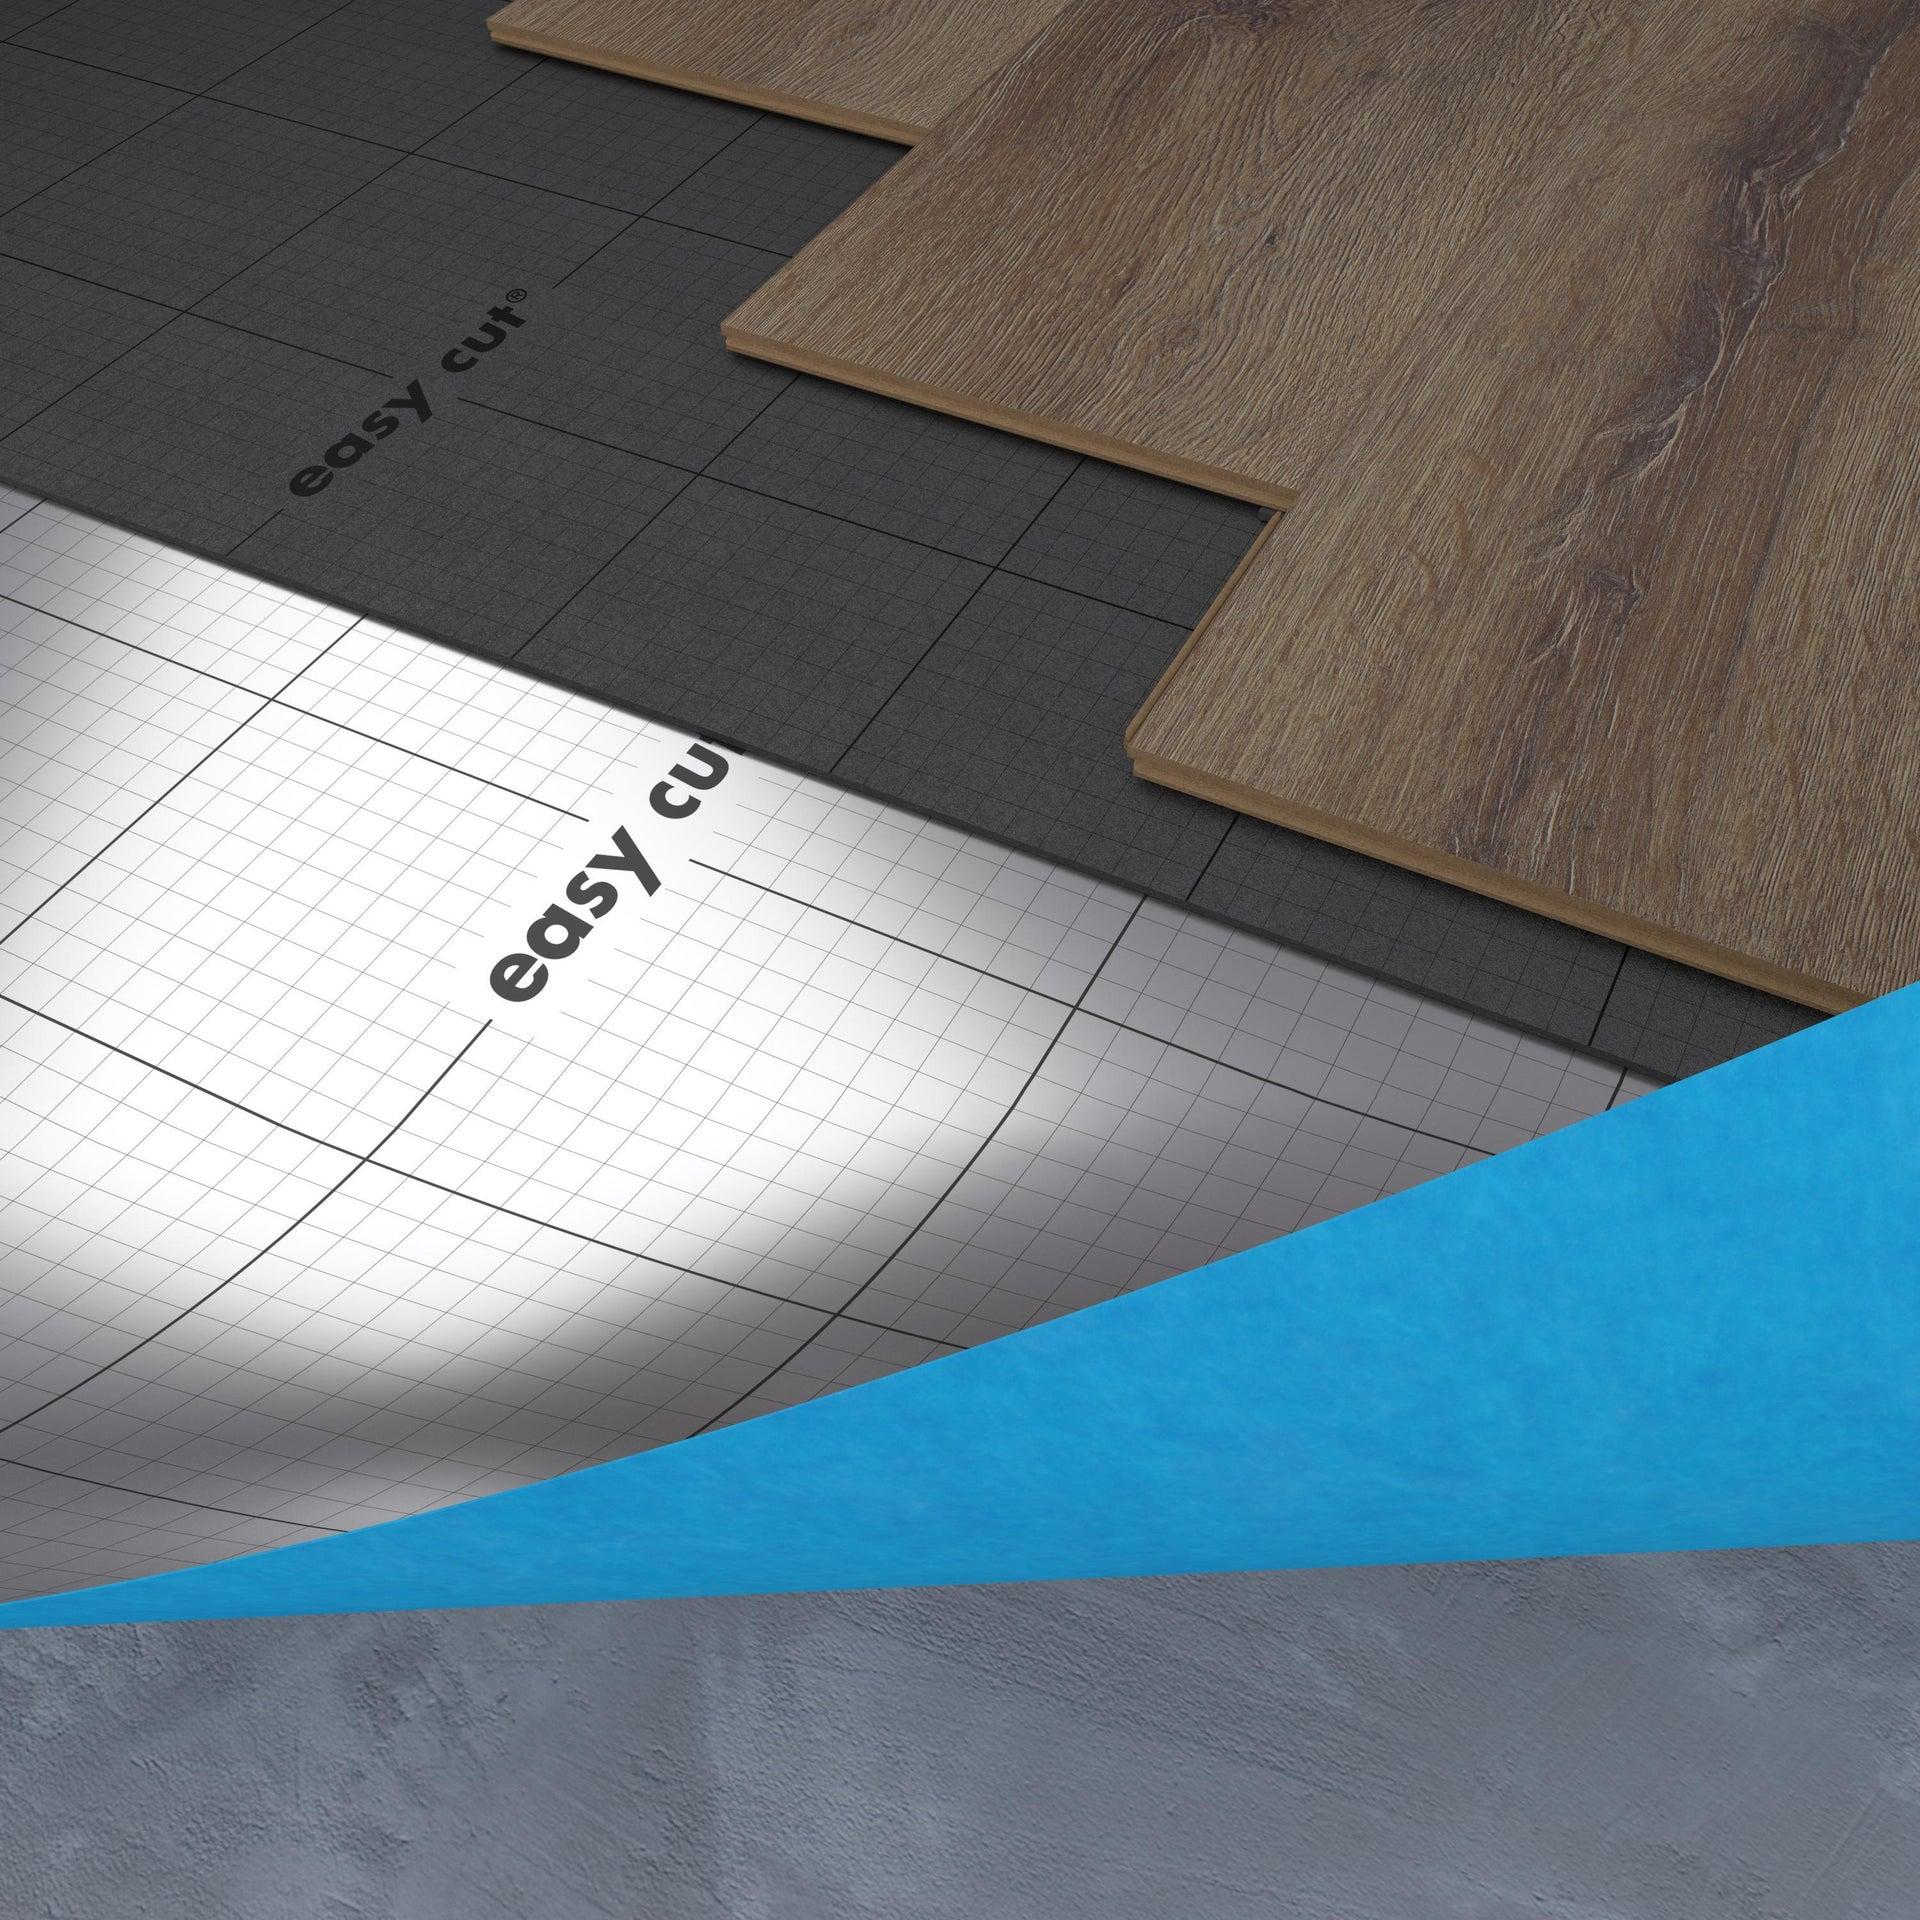 Sottopavimento AXTON Aqua Protect Sp 0.2 mm - 15